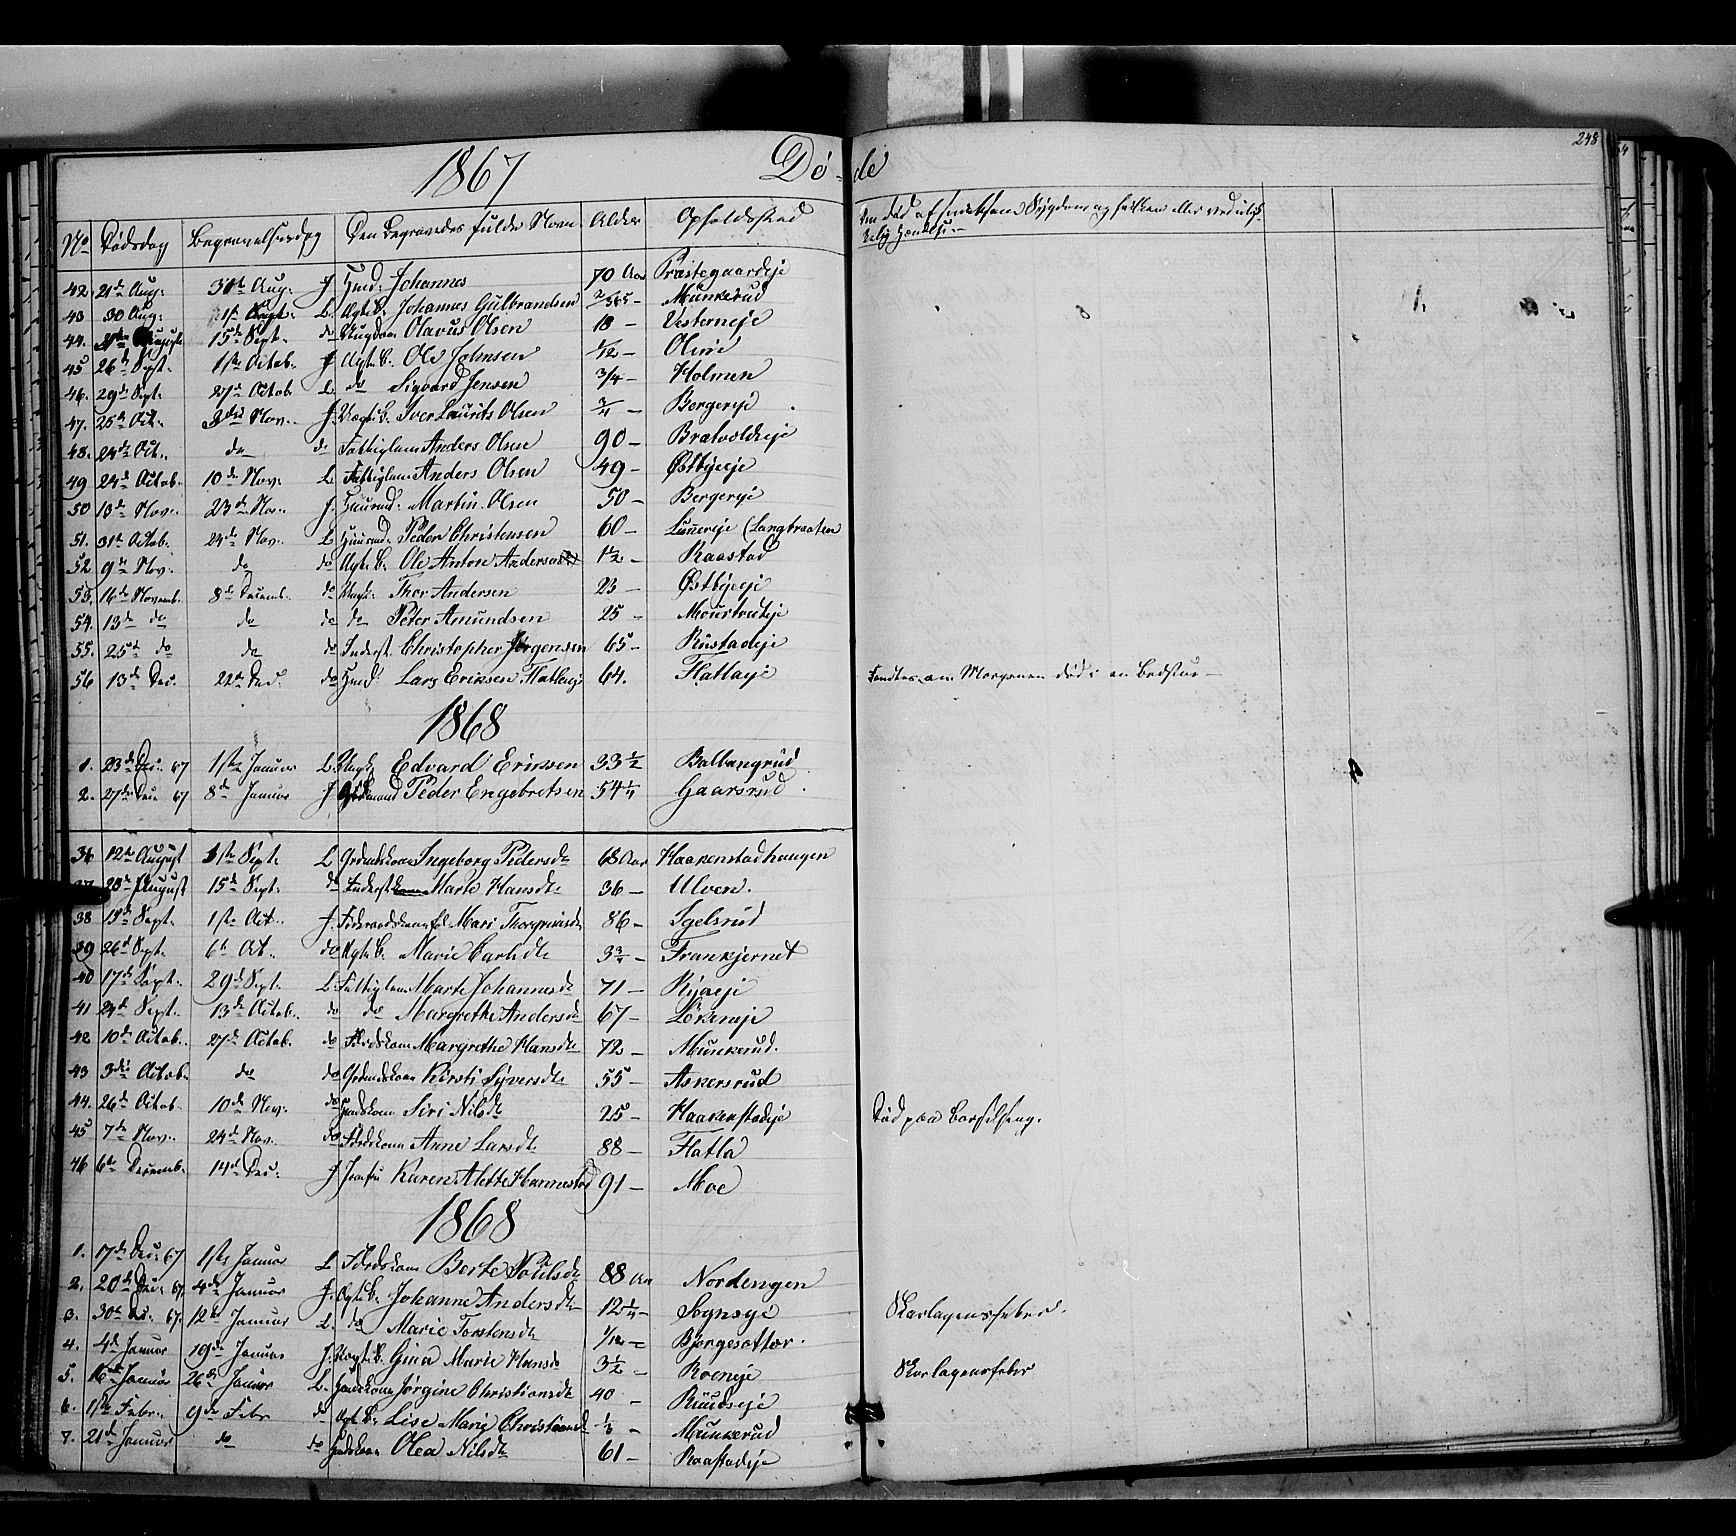 SAH, Jevnaker prestekontor, Ministerialbok nr. 7, 1858-1876, s. 248